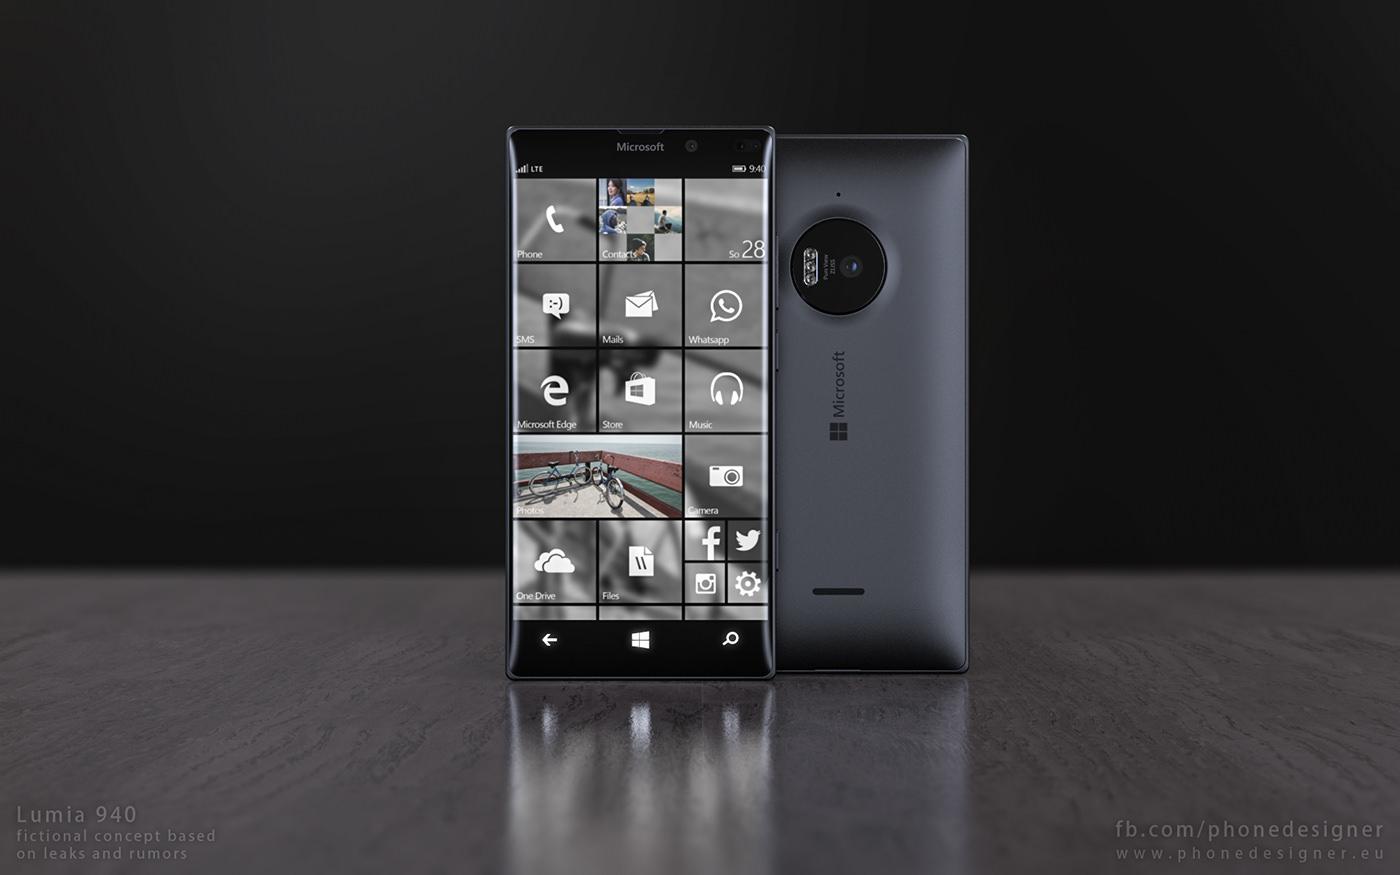 Kar��n�zda �er�evesiz Lumia 940 konsepti